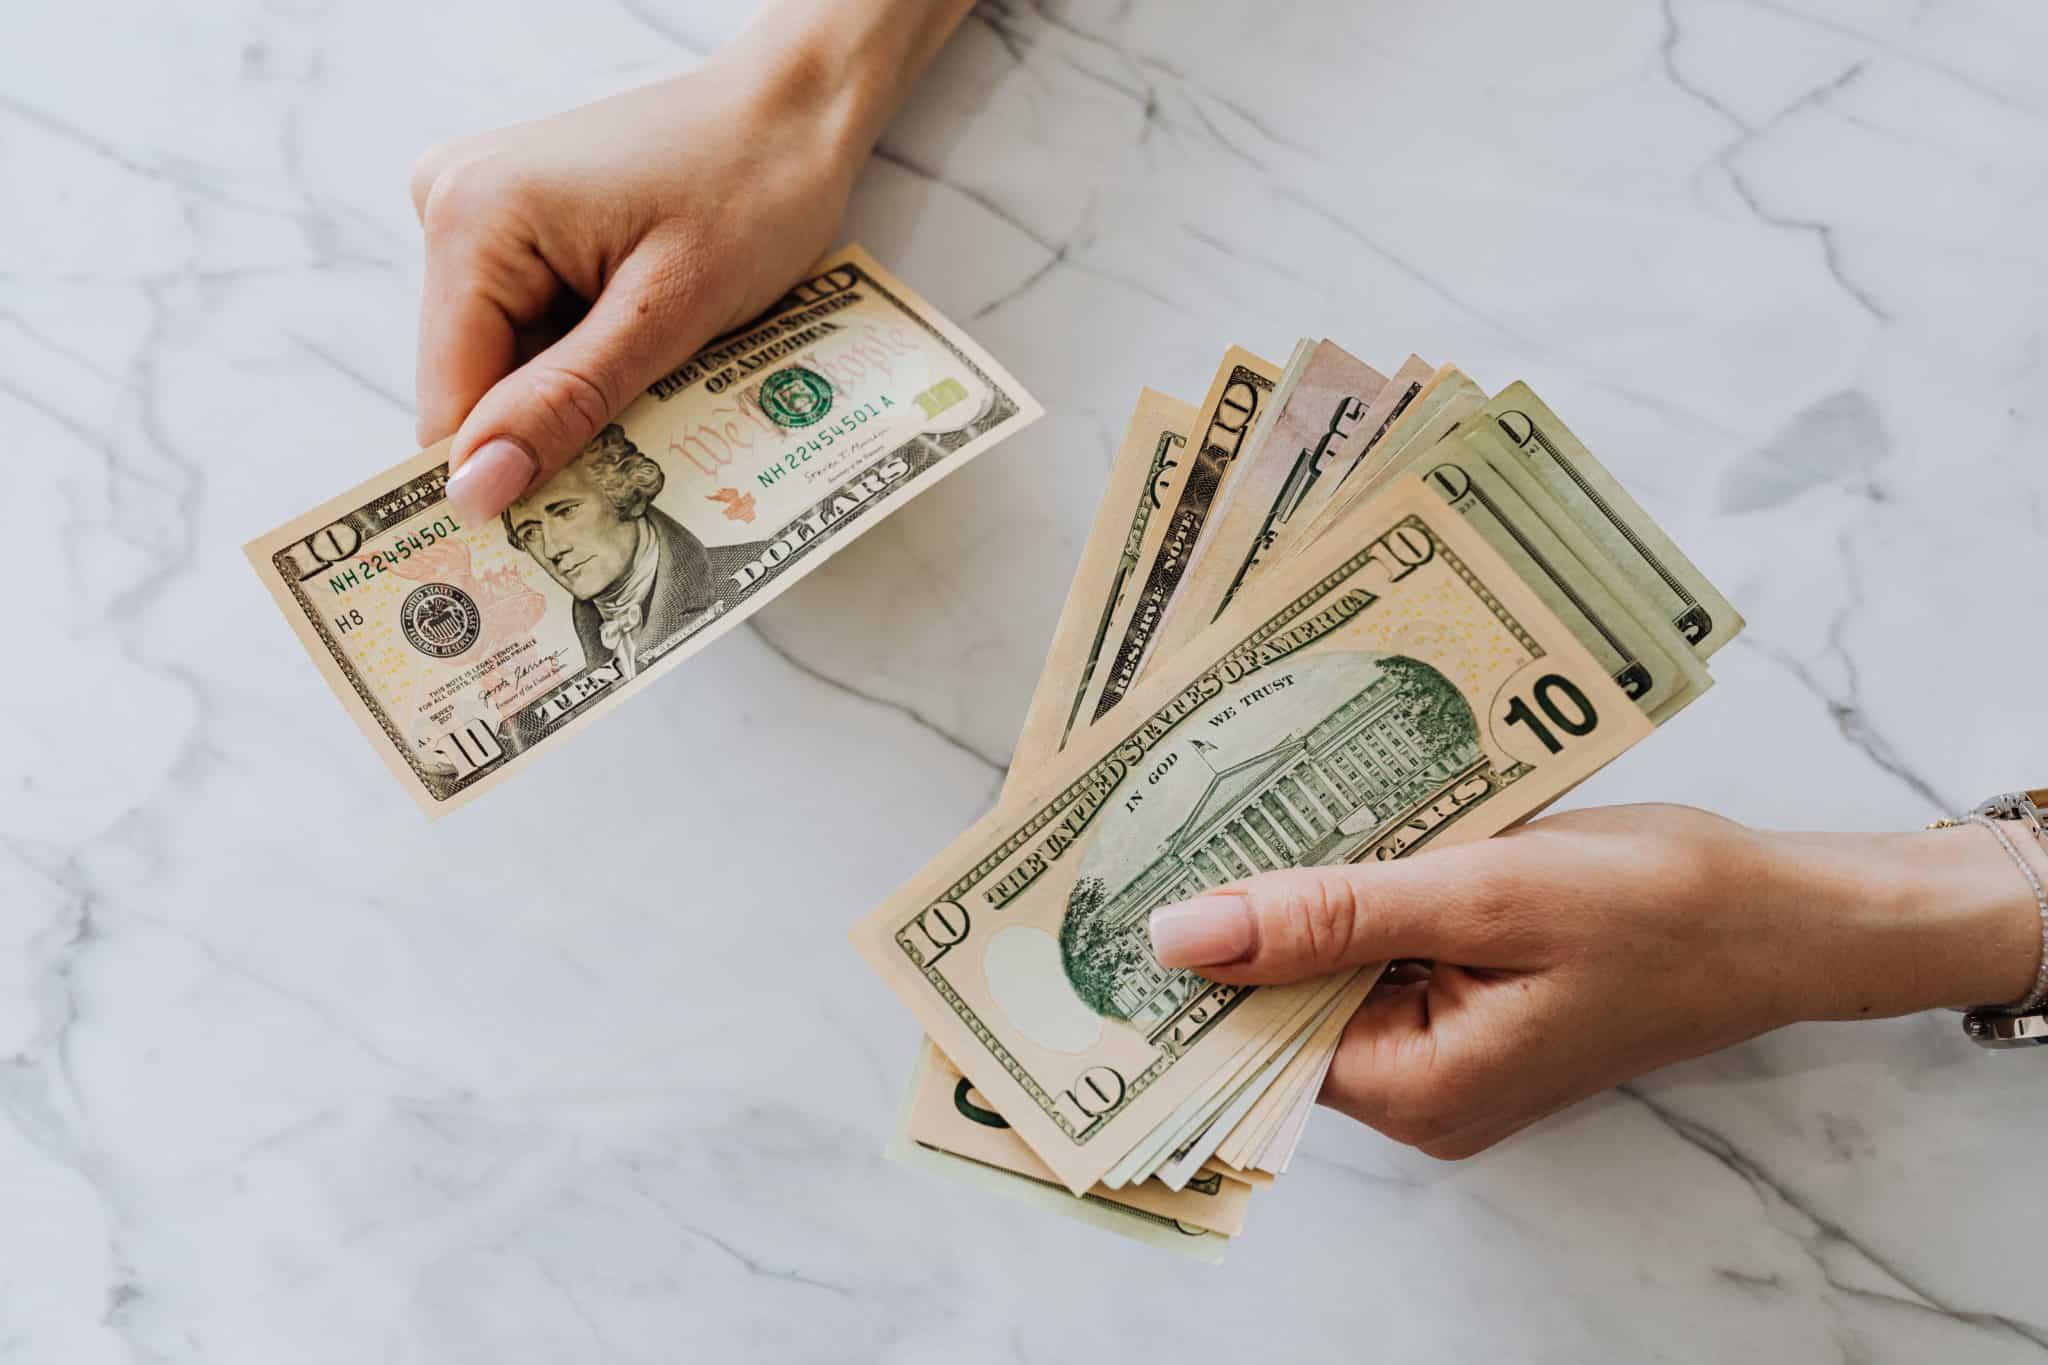 Get Cash Advance Payday Loans In Phoenix AZ